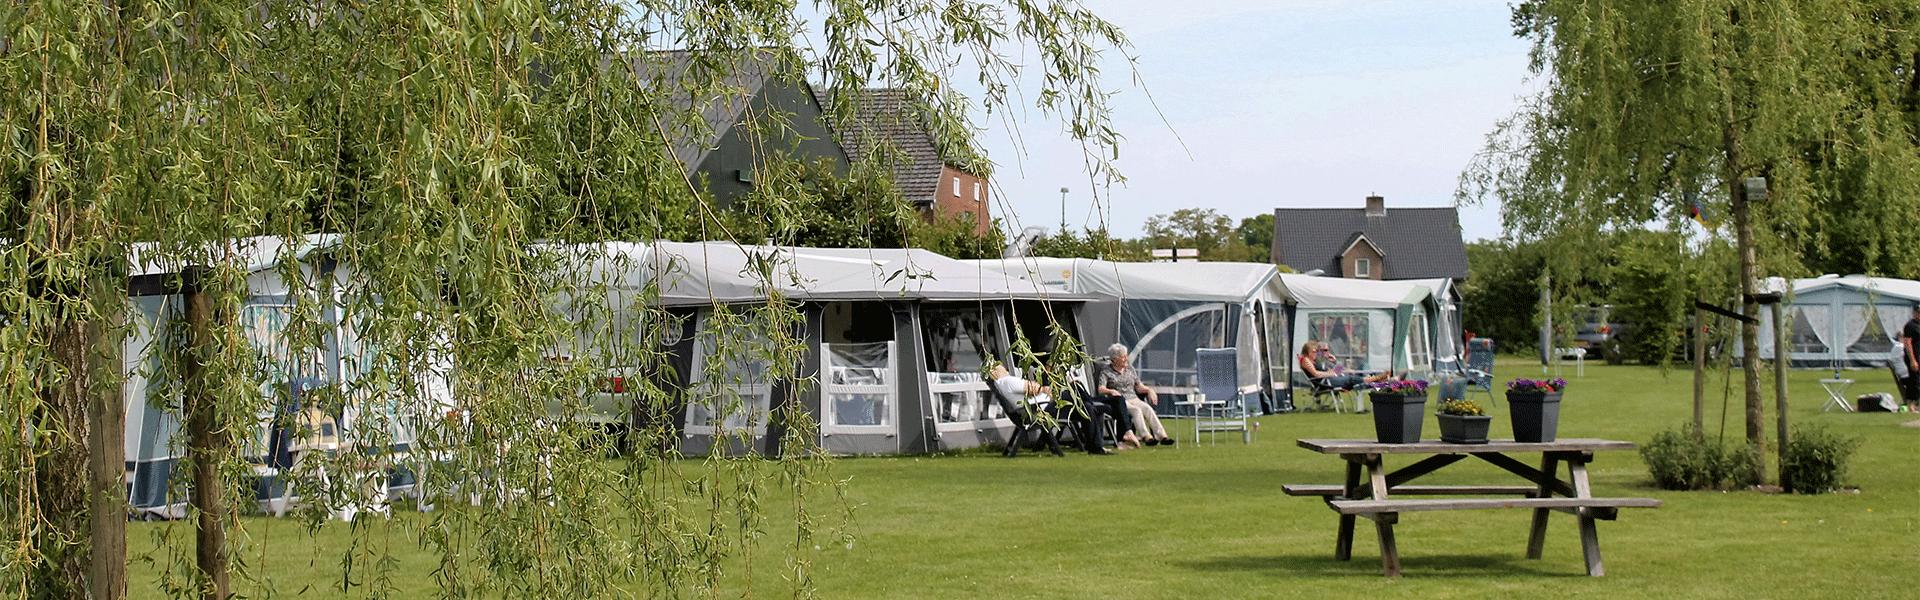 kleine camping in Brabant